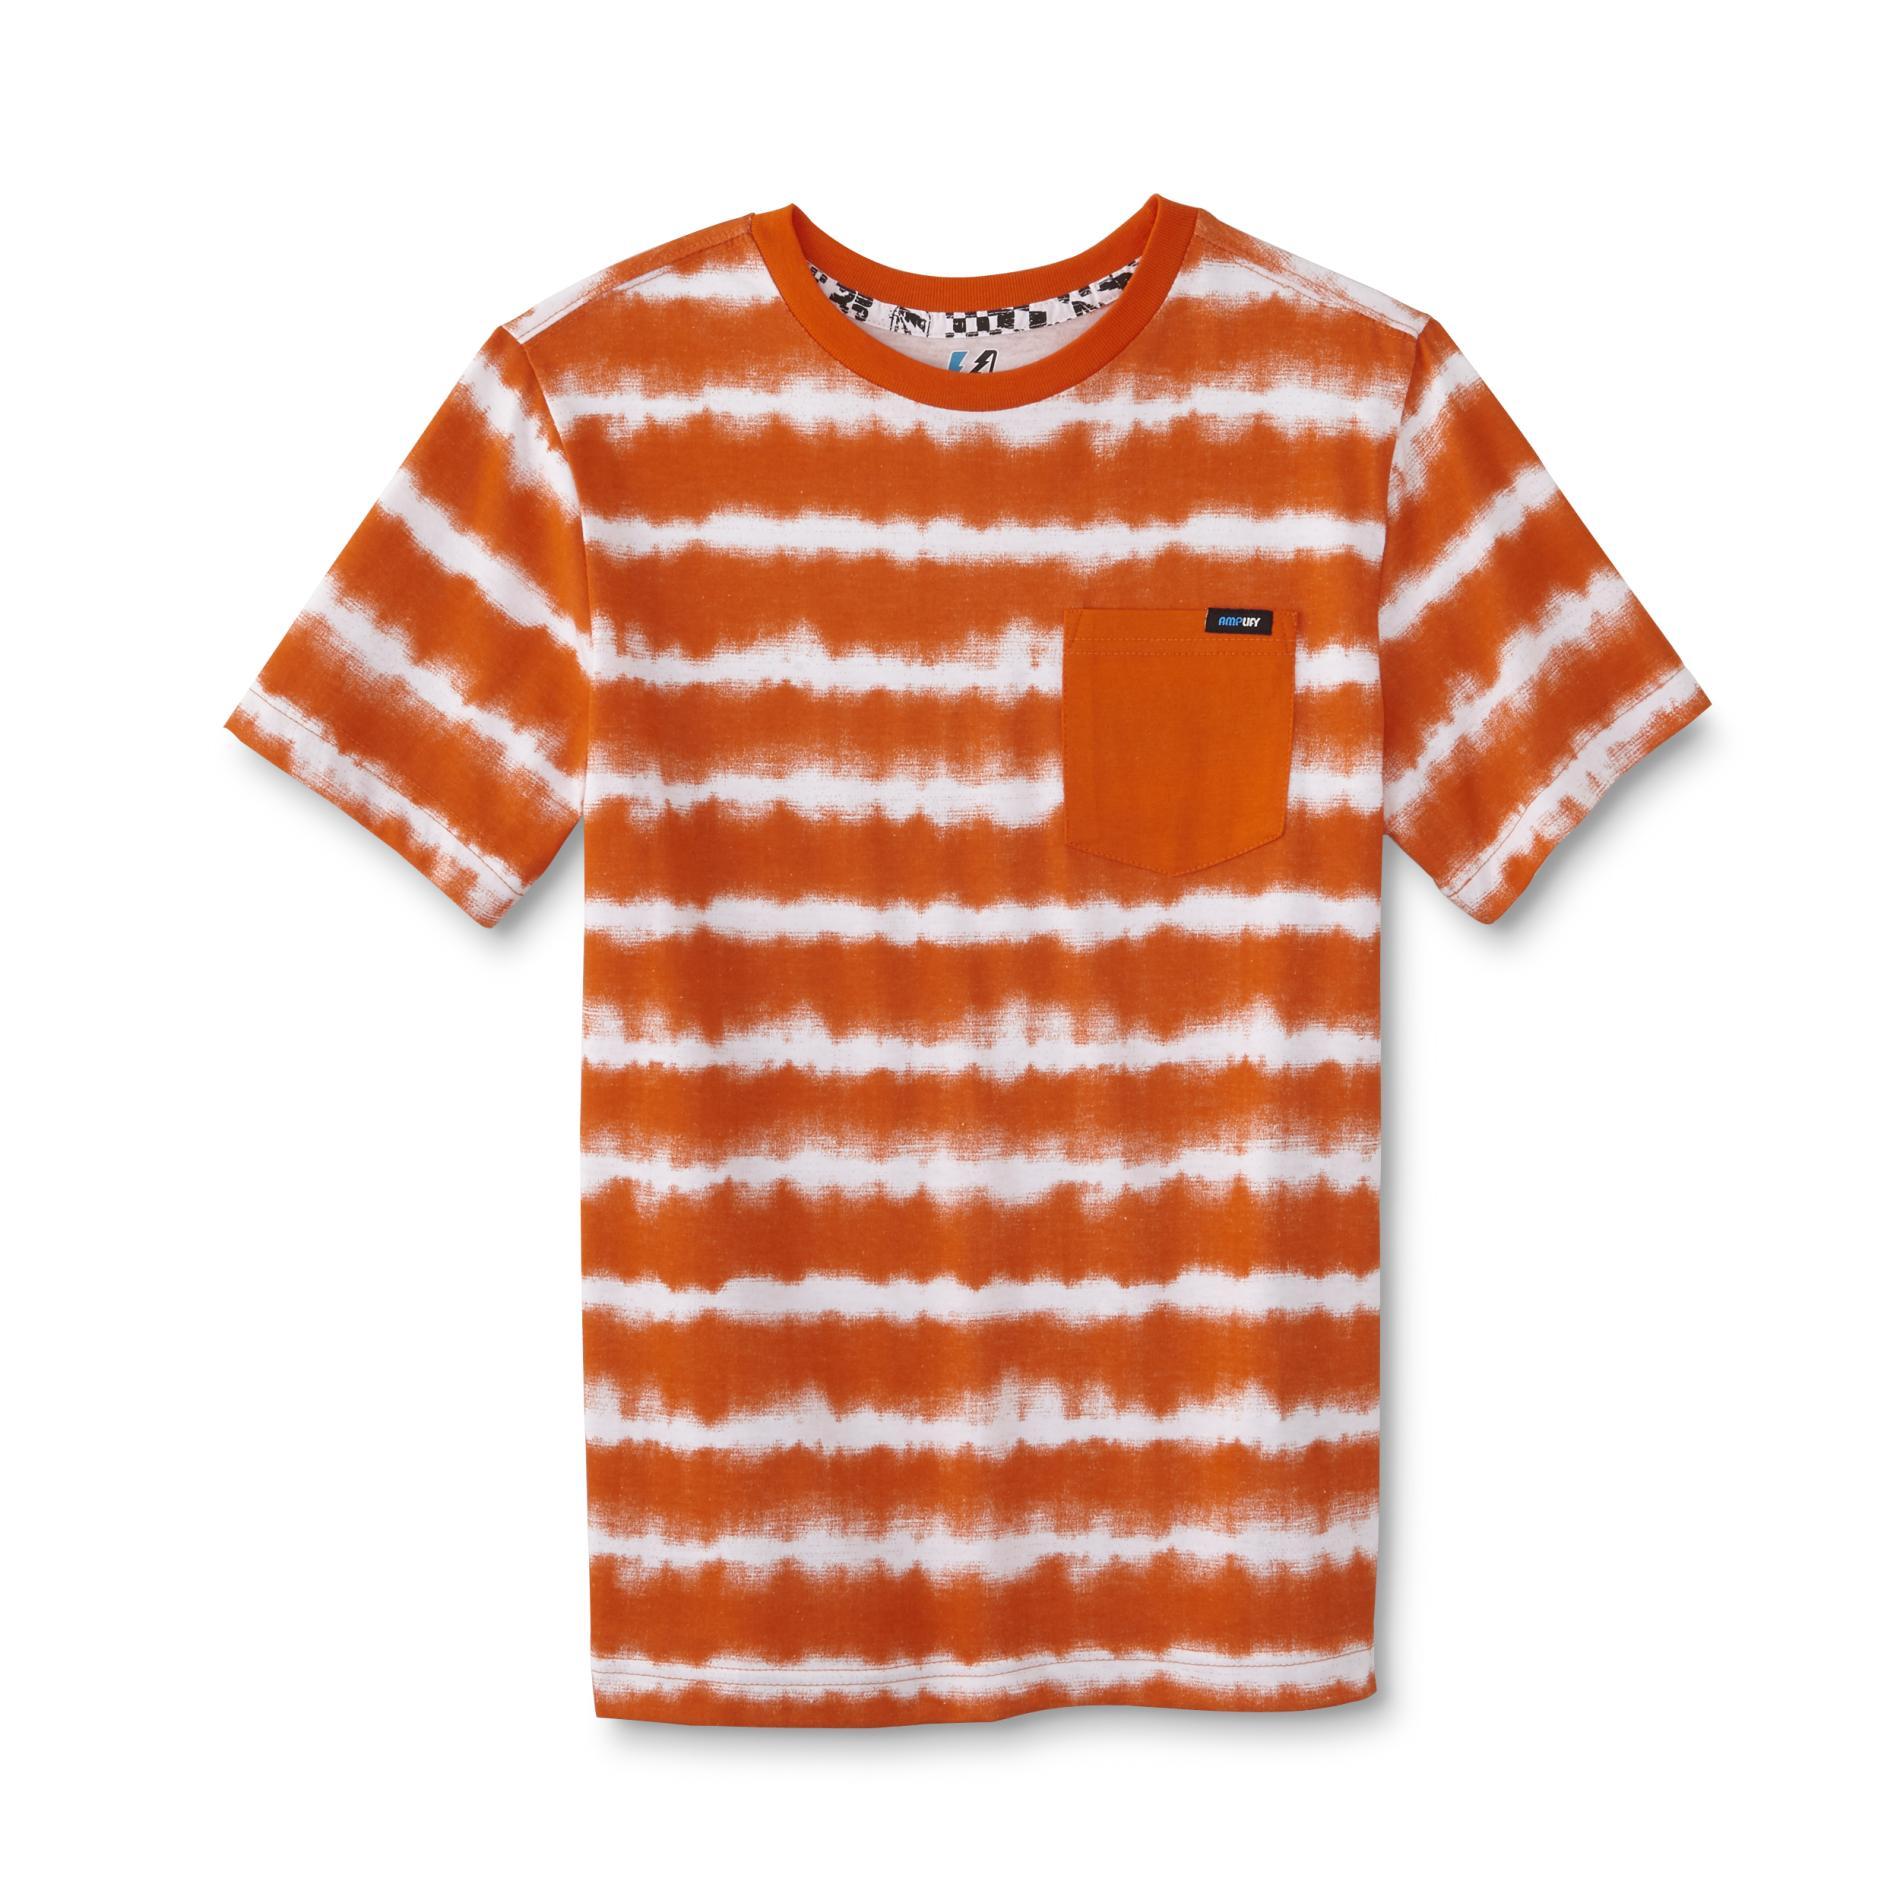 Amplify Boys' Pocket T-Shirt - Tie-Dye PartNumber: A014361774 MfgPartNumber: BU8AM71201BB